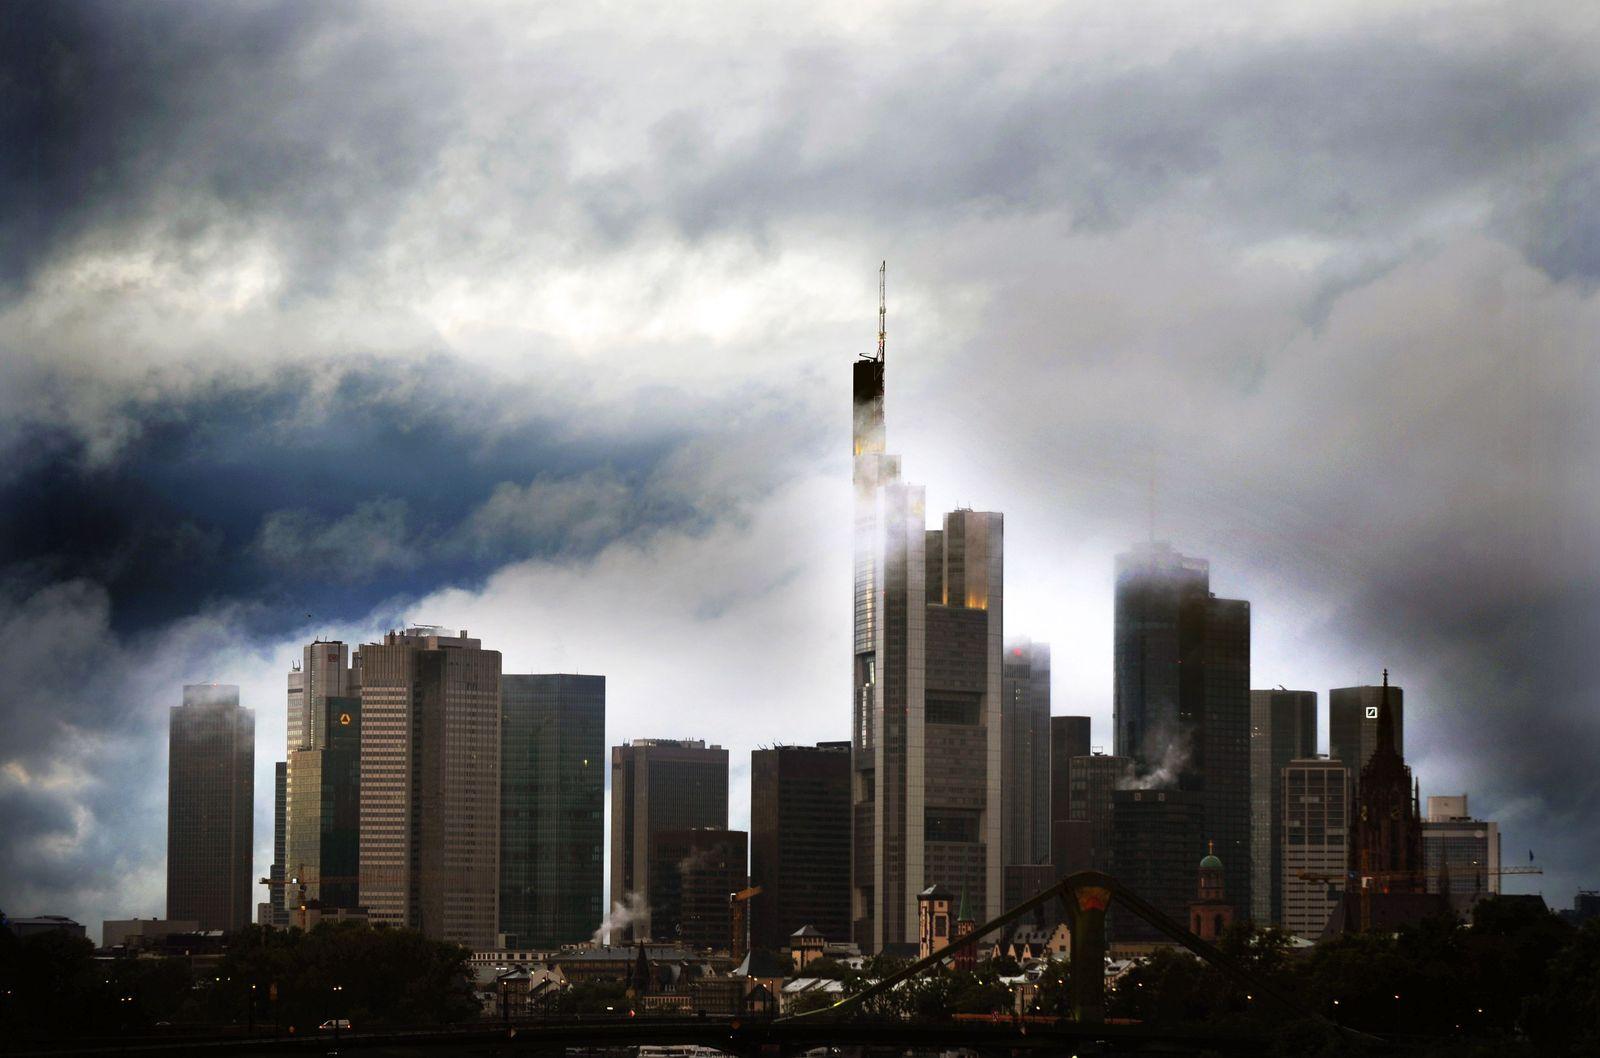 Frankfurt / Skyline / Banken / Banken-Viertel